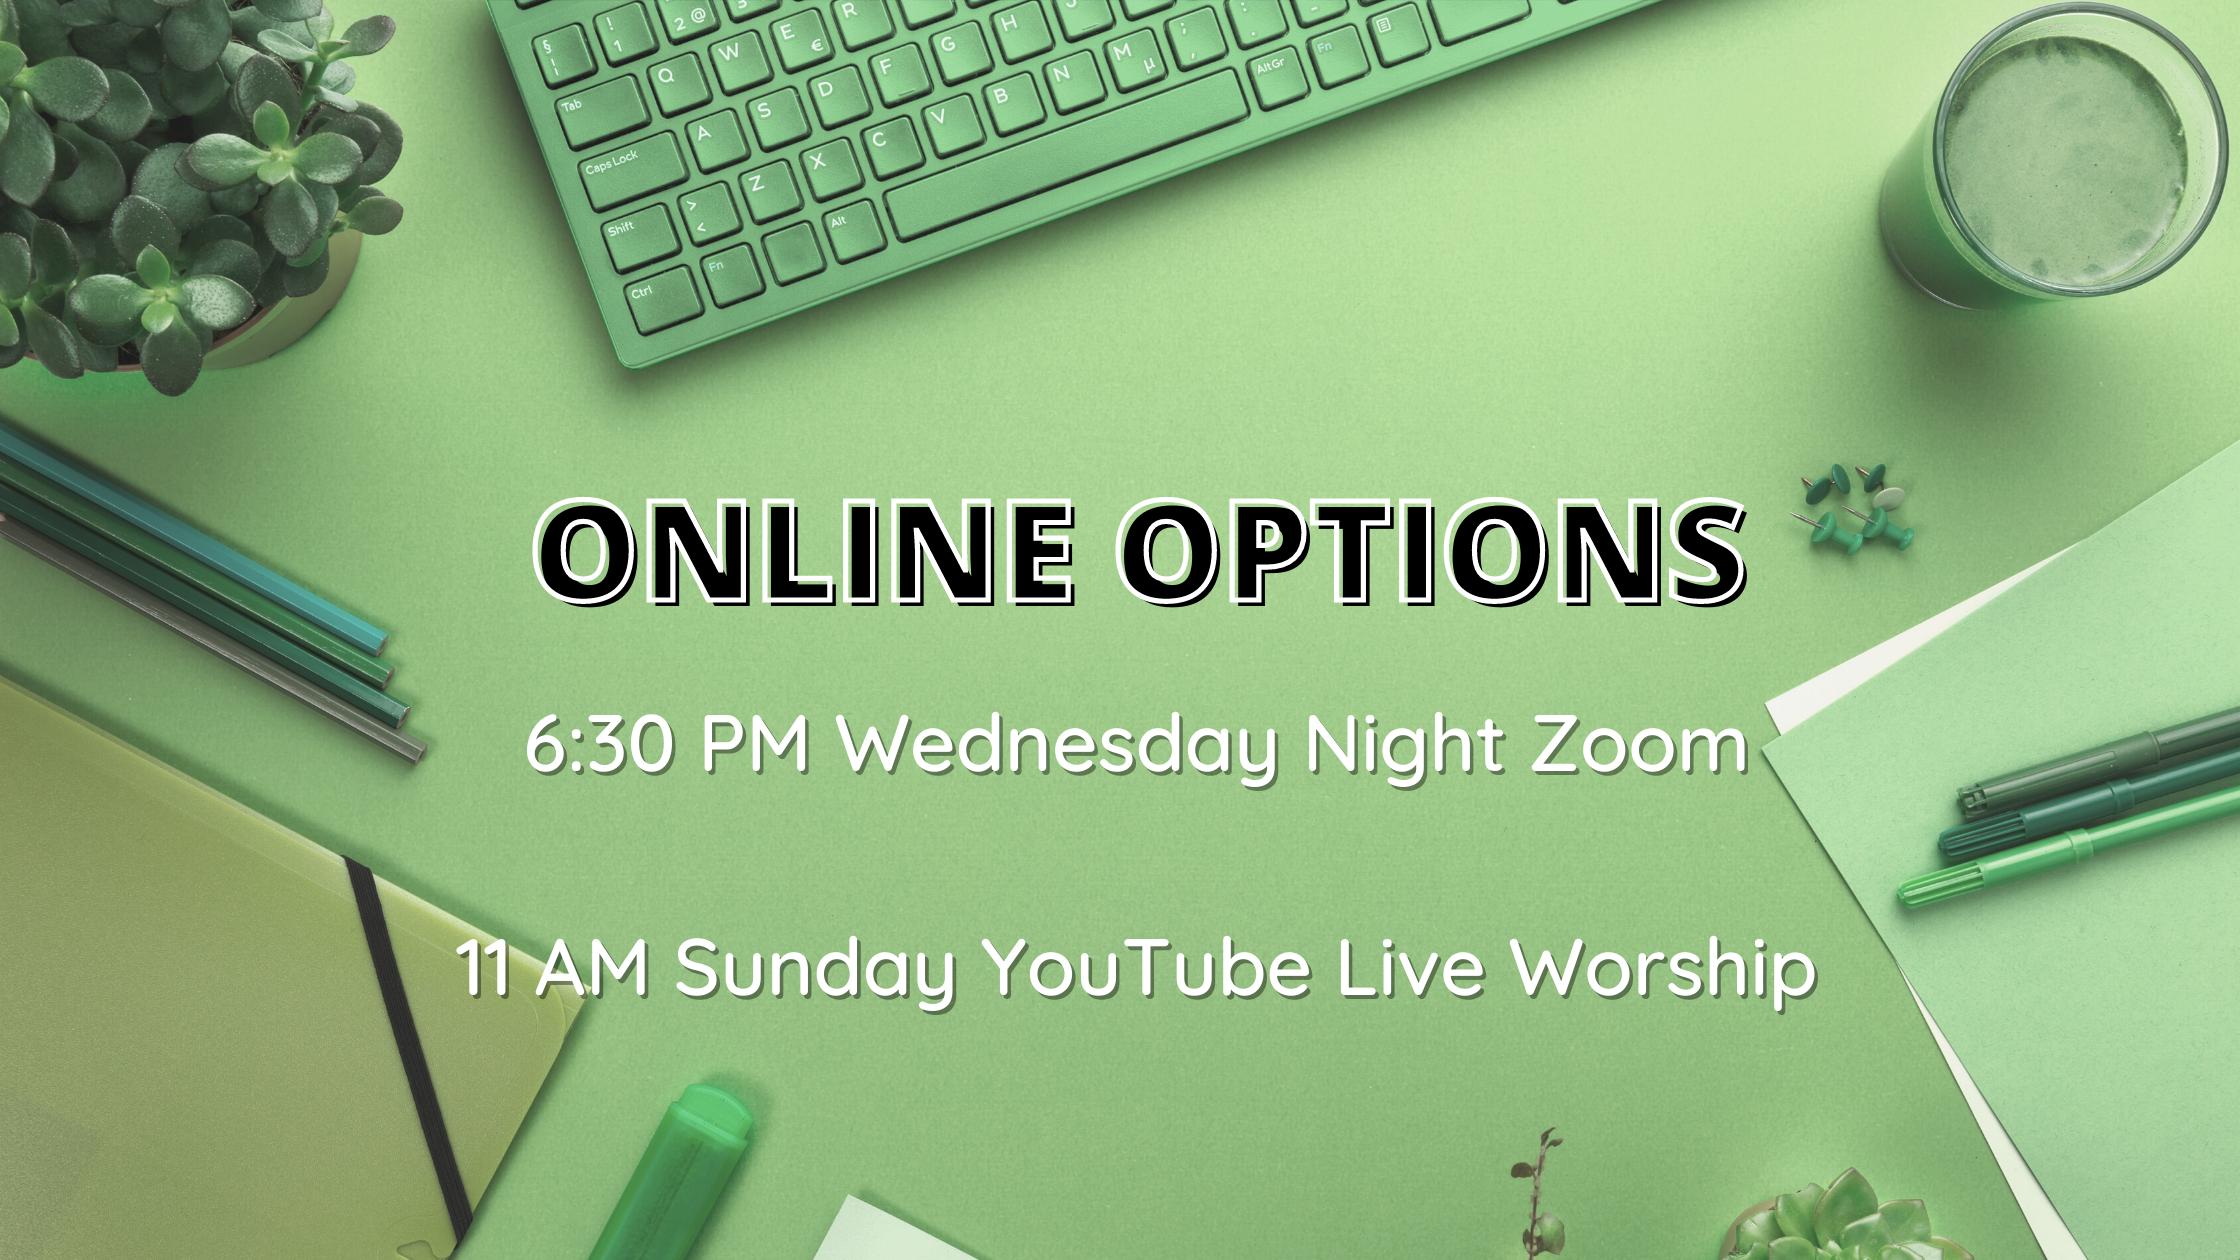 Online Options